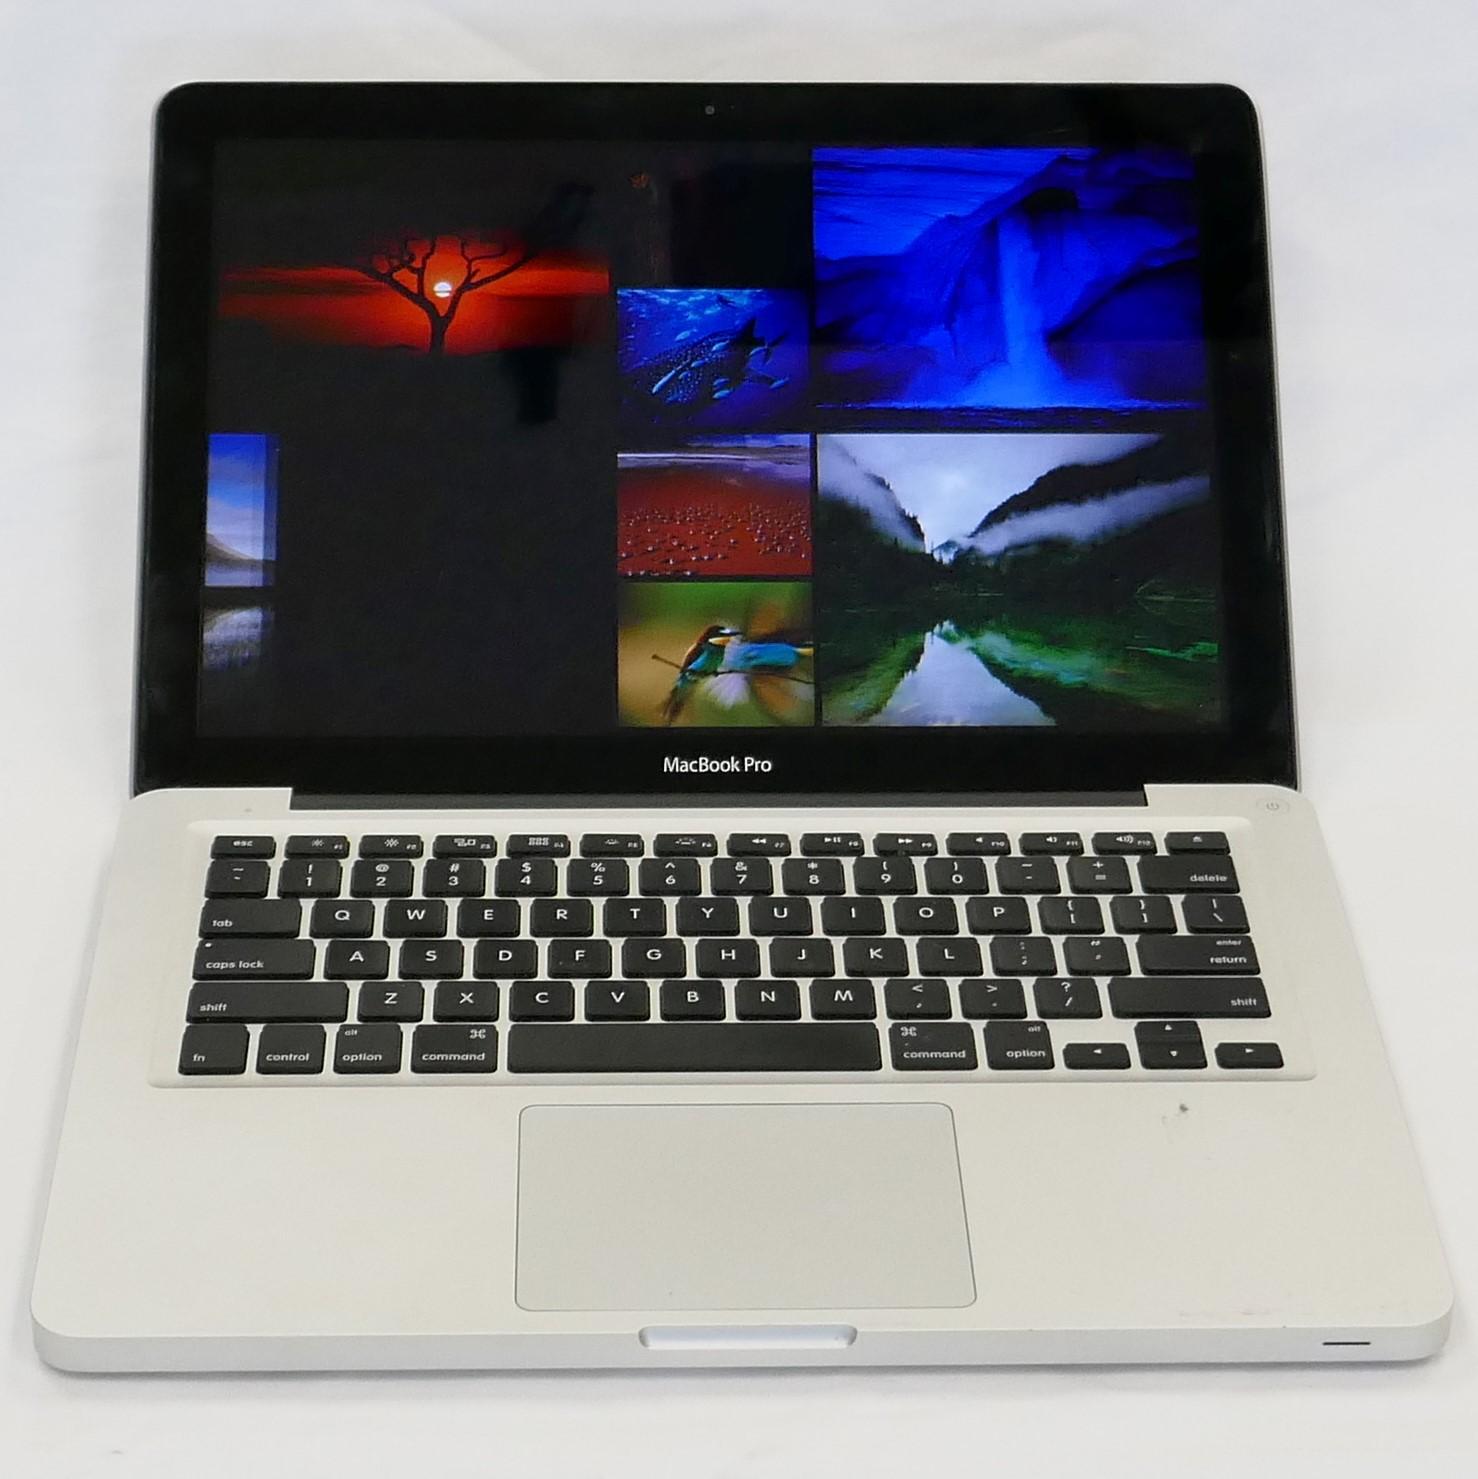 Apple MacBook Pro A1278 Intel Core i5 4GB Mid 2012 SILVER